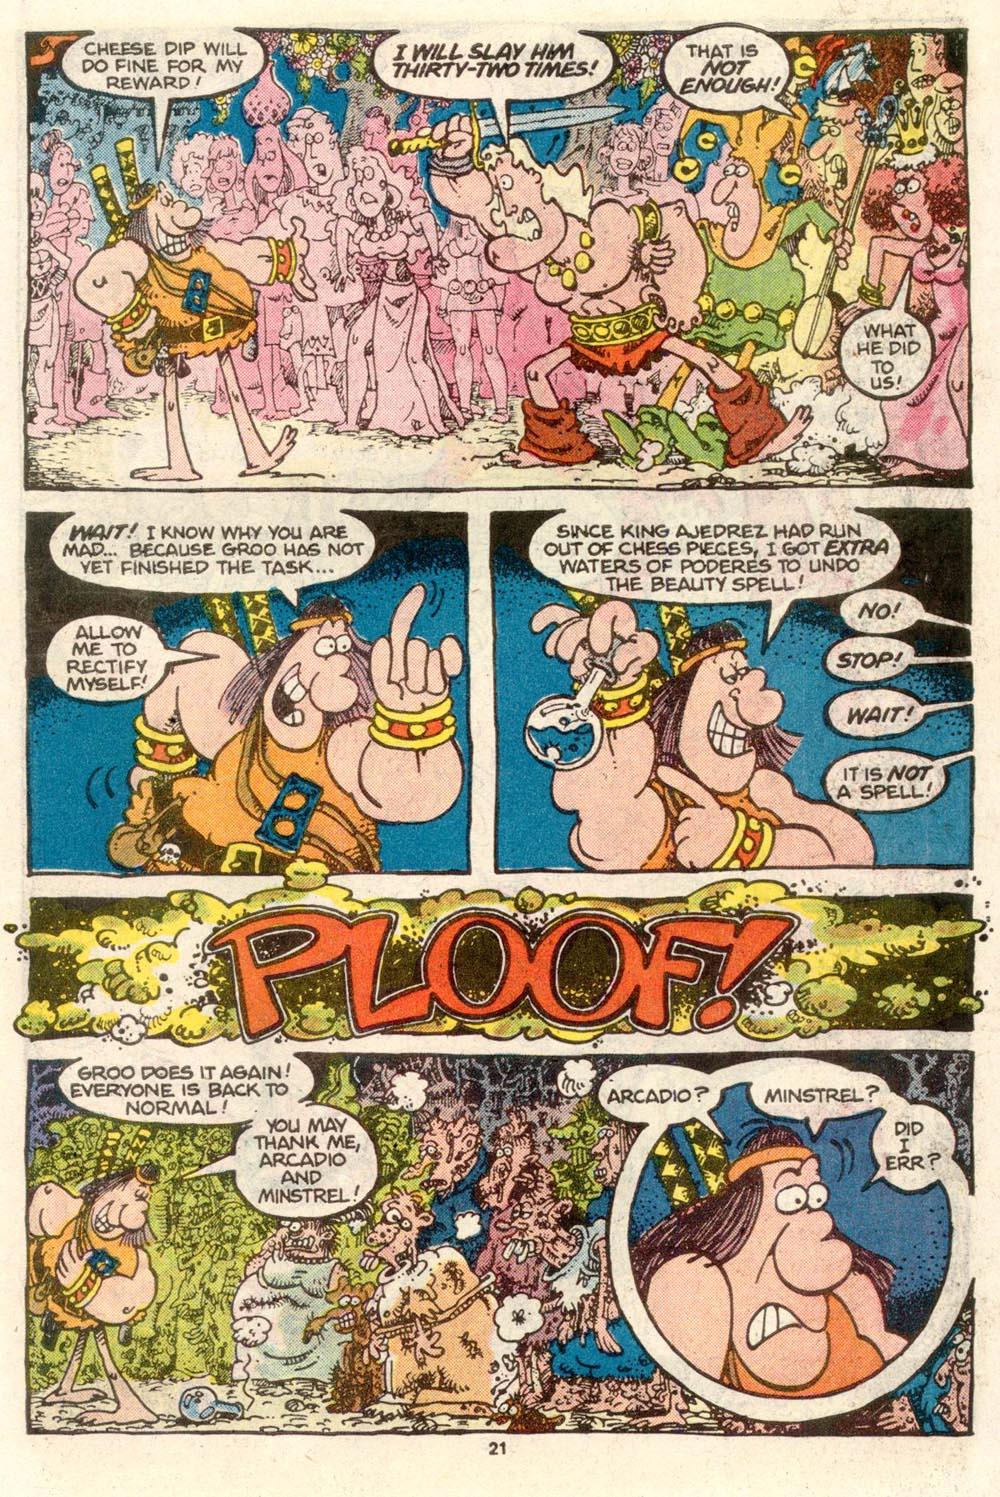 Read online Sergio Aragonés Groo the Wanderer comic -  Issue #24 - 23